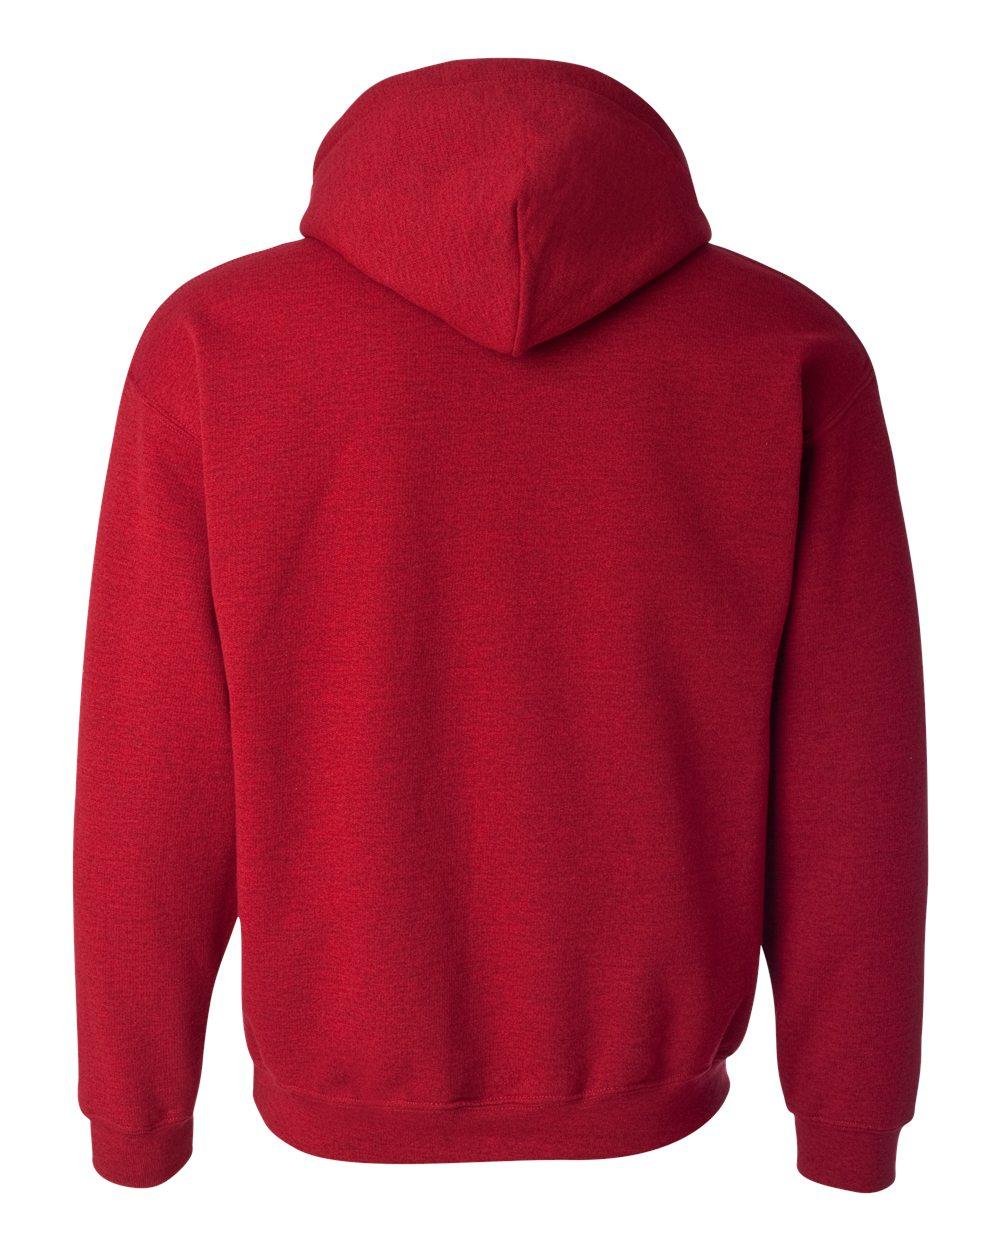 Gildan-Mens-Blank-Hoodie-Heavy-Blend-Hooded-Sweatshirt-18500-up-to-5XL thumbnail 7